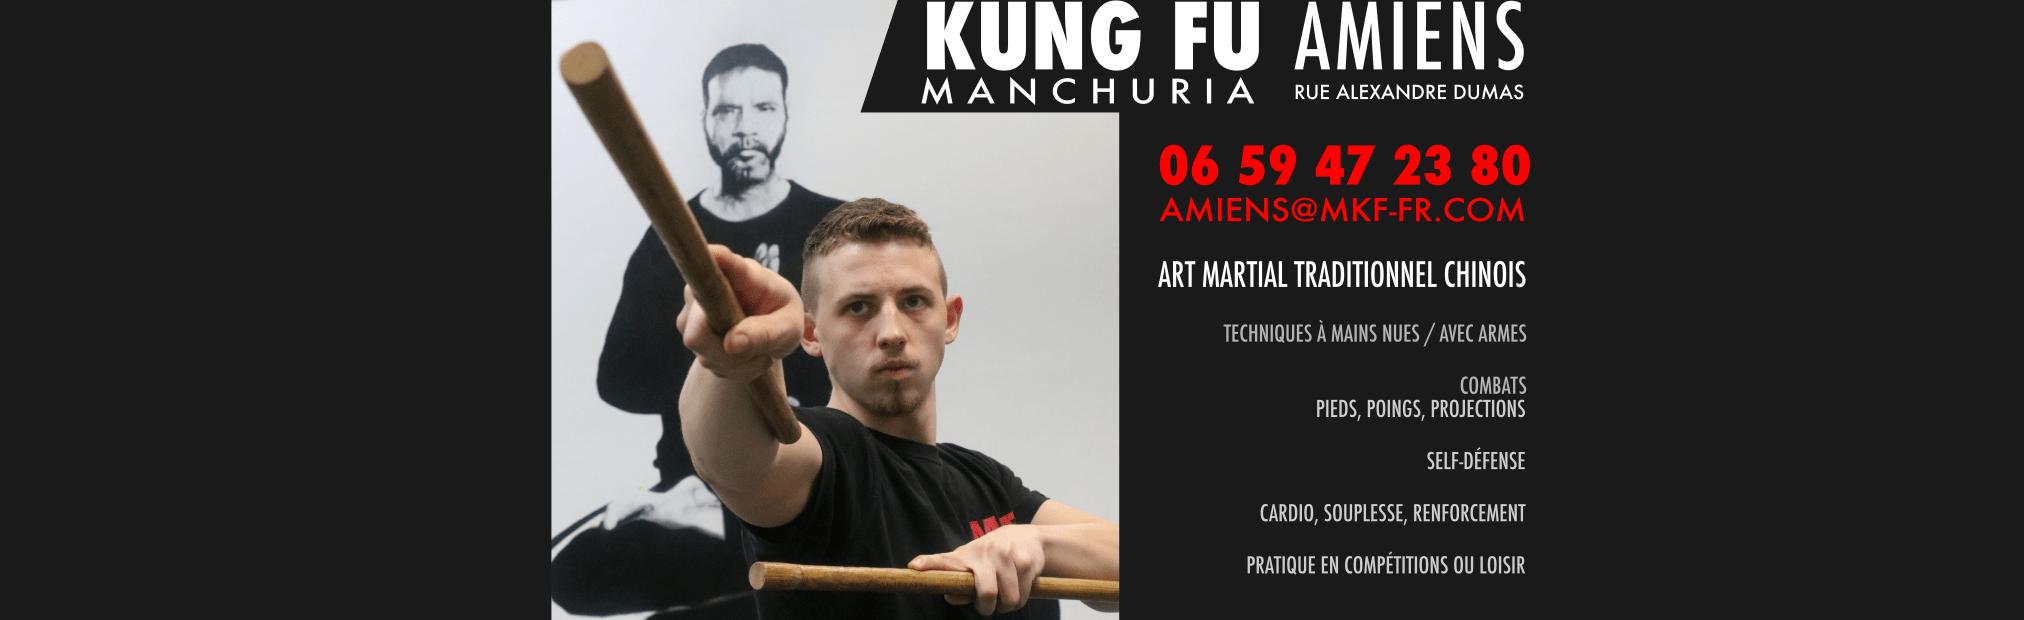 Manchuria Kung Fu Amiens - Arts Martiaux MKF